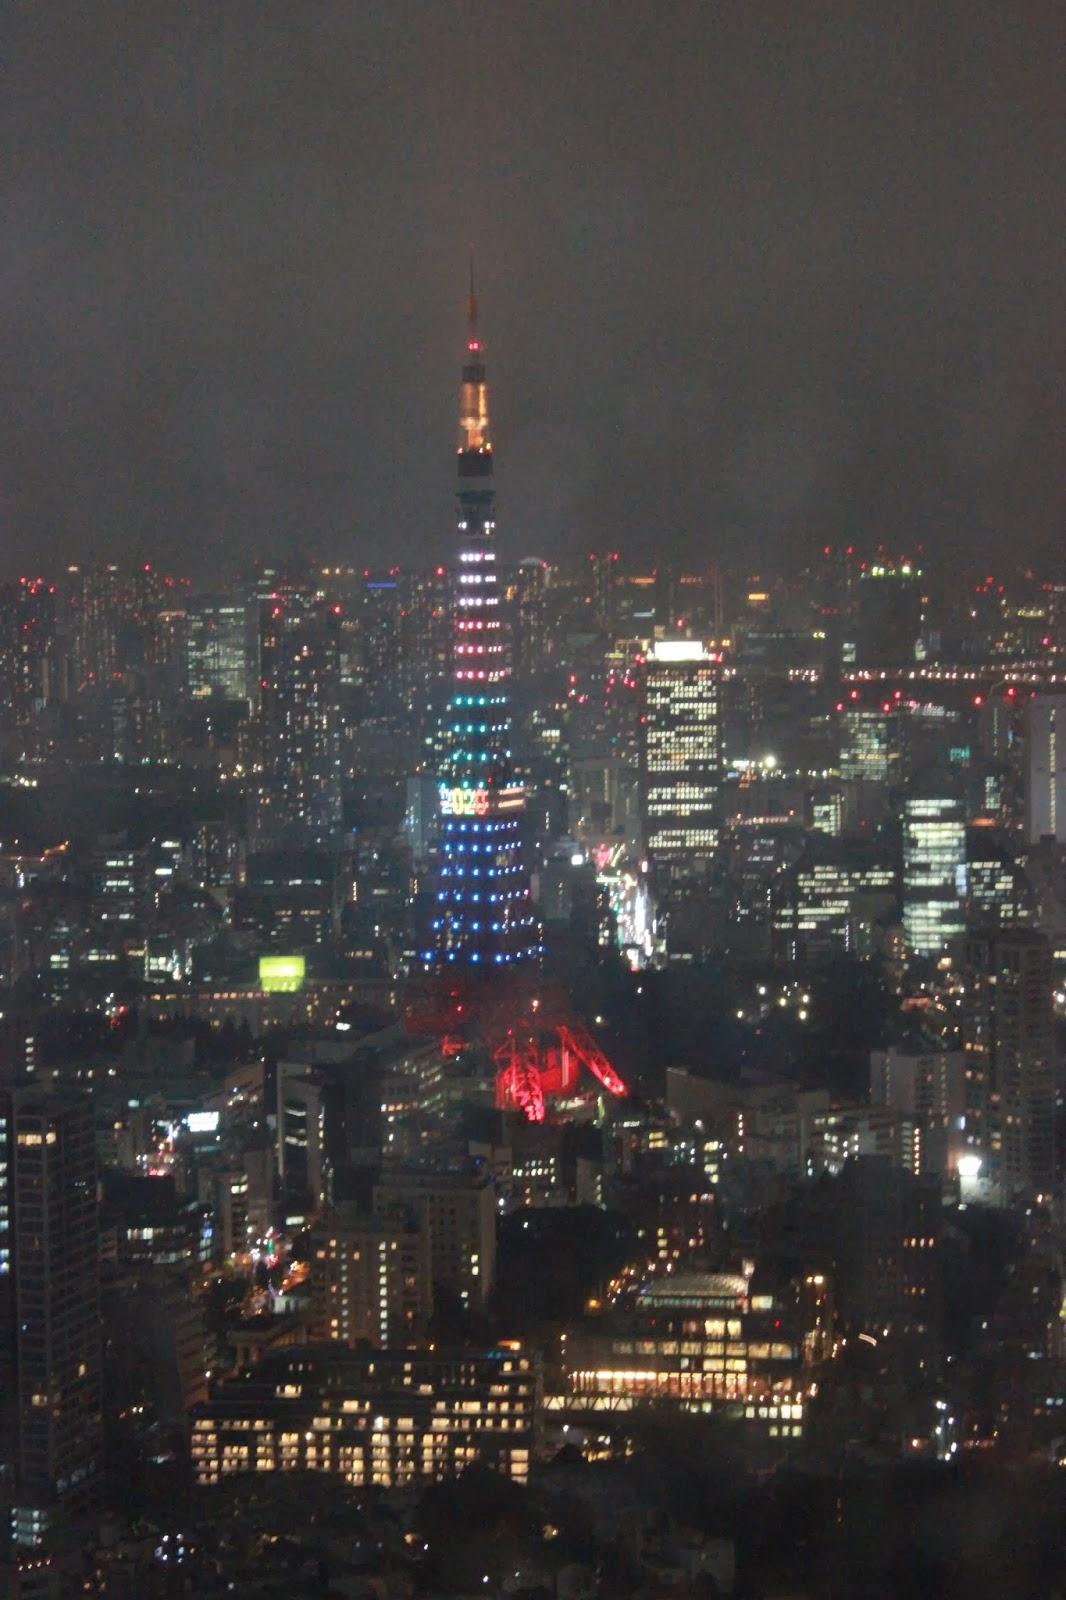 Japan 2020 Olympics